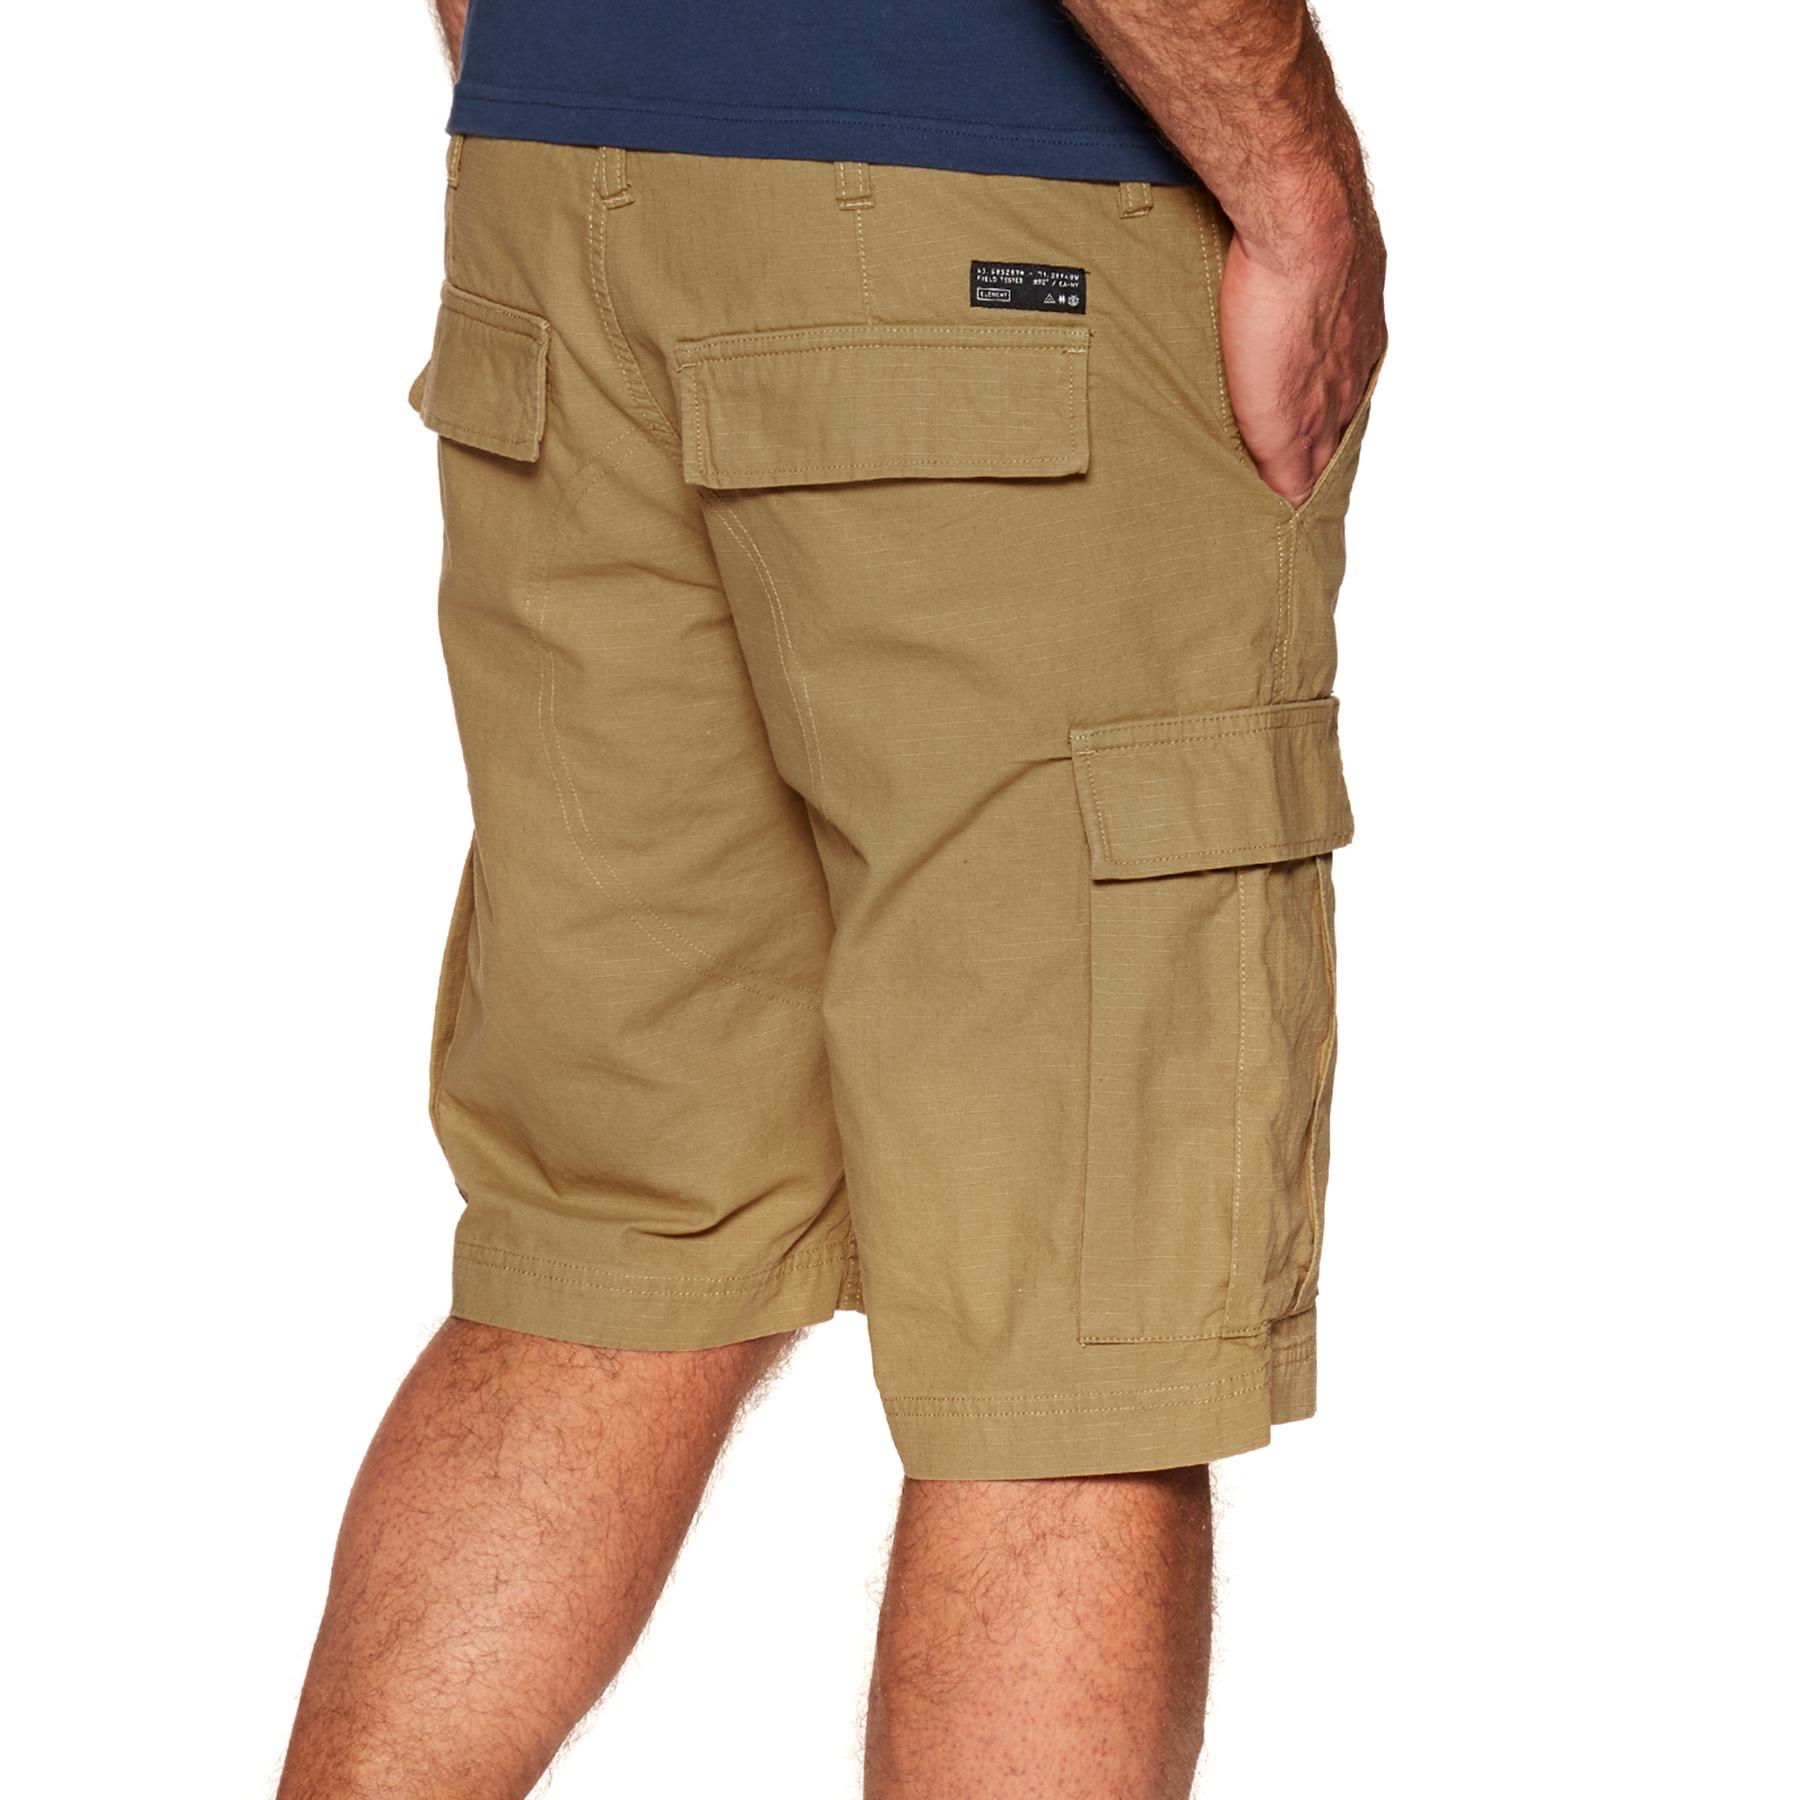 May Collection Overall patta Pantaloni kurzgrösse MIS 32-38